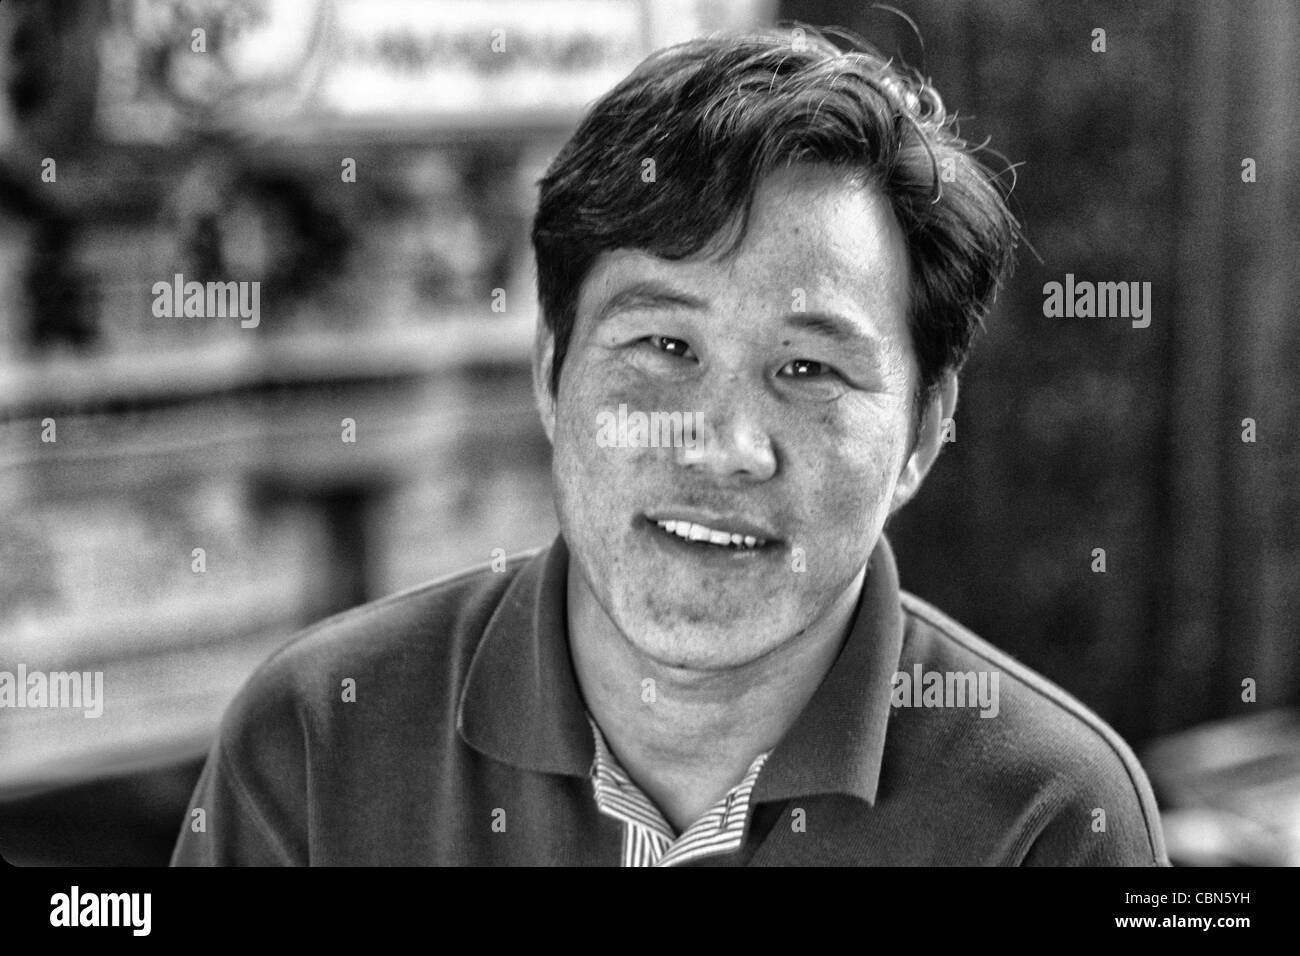 Portrait of Native Man in Ulaan Baatar Mongolia - Stock Image